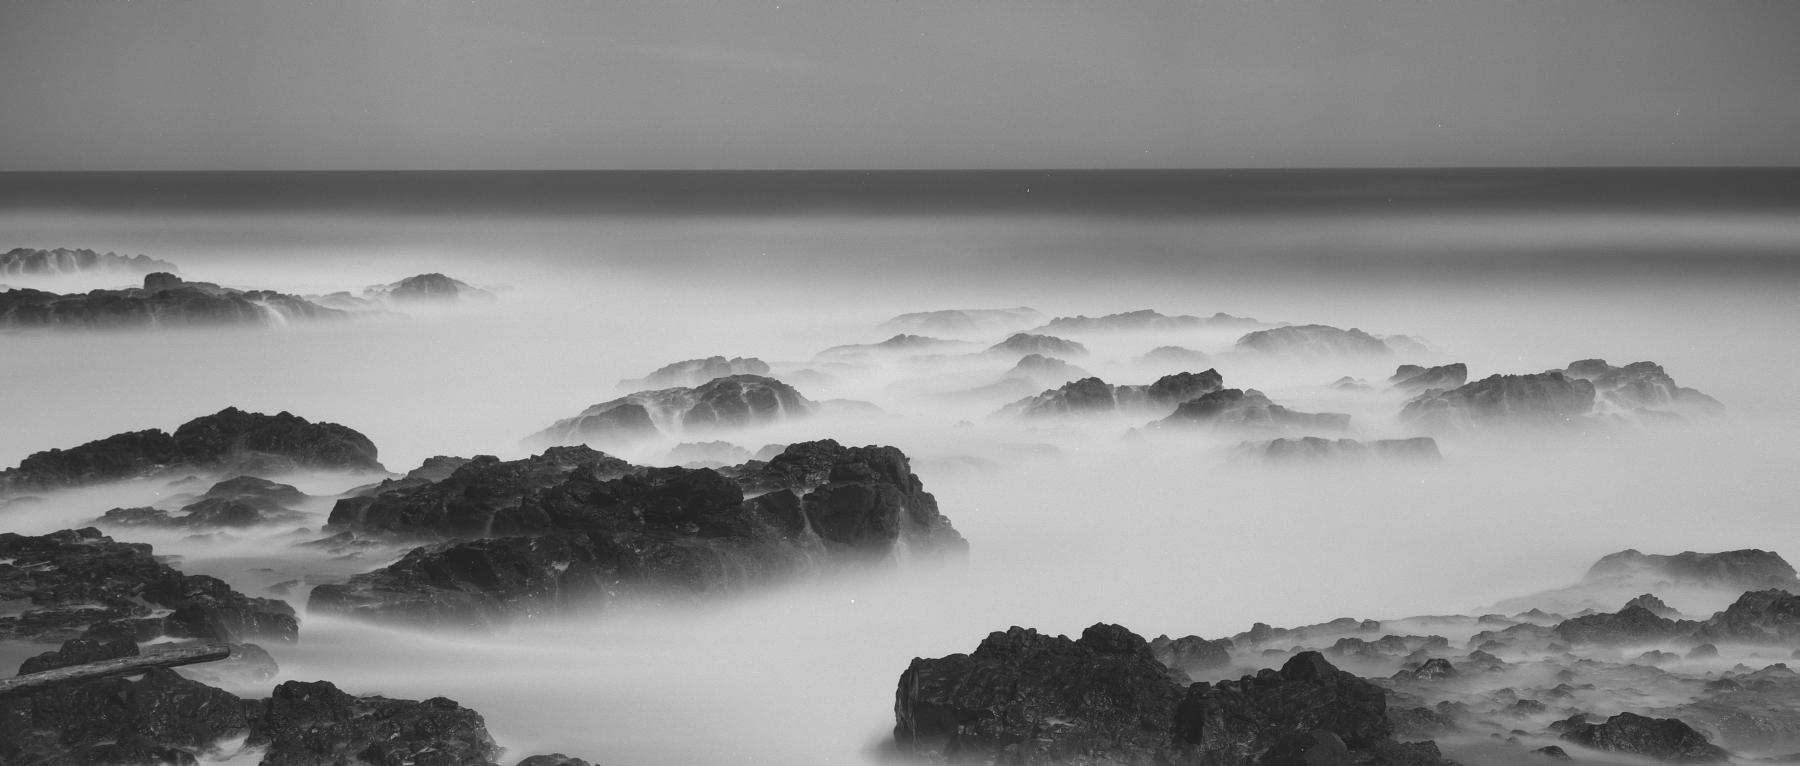 HW Kateley |Surf In Moon Light |Fuji GW690 |Acros 100